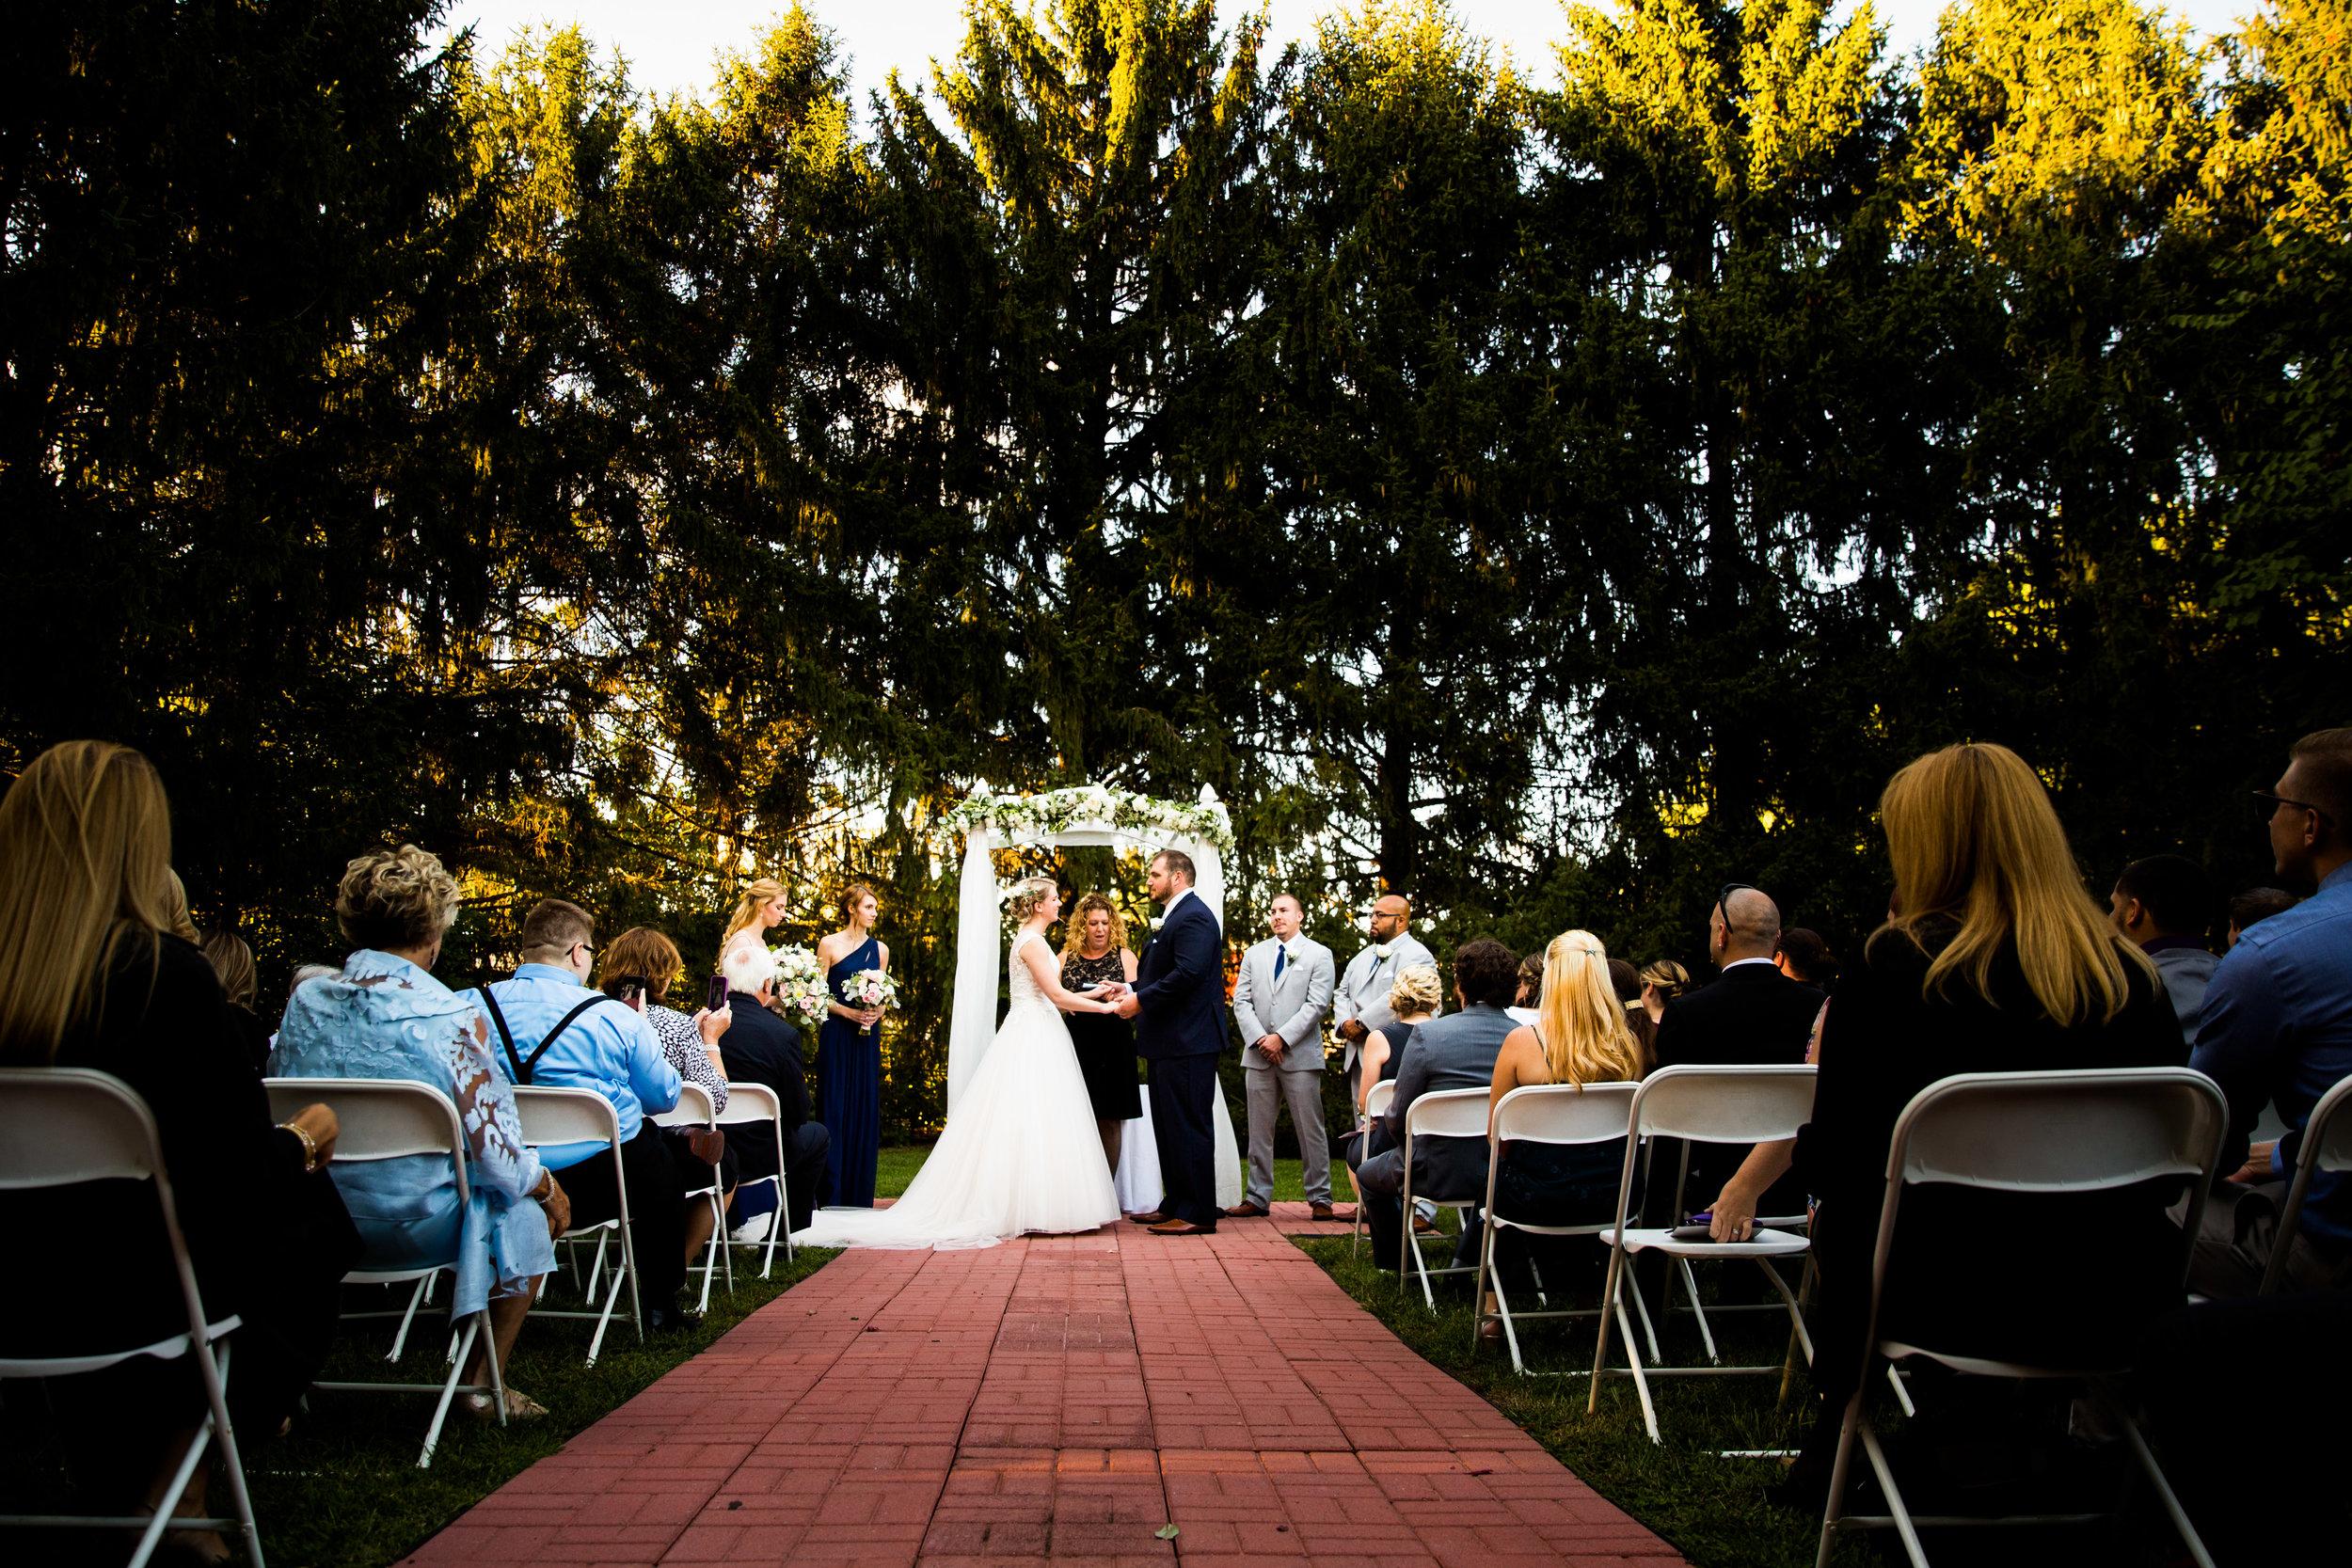 LA LUNA BANQUET HALL WEDDING BENSALEM - 048.jpg